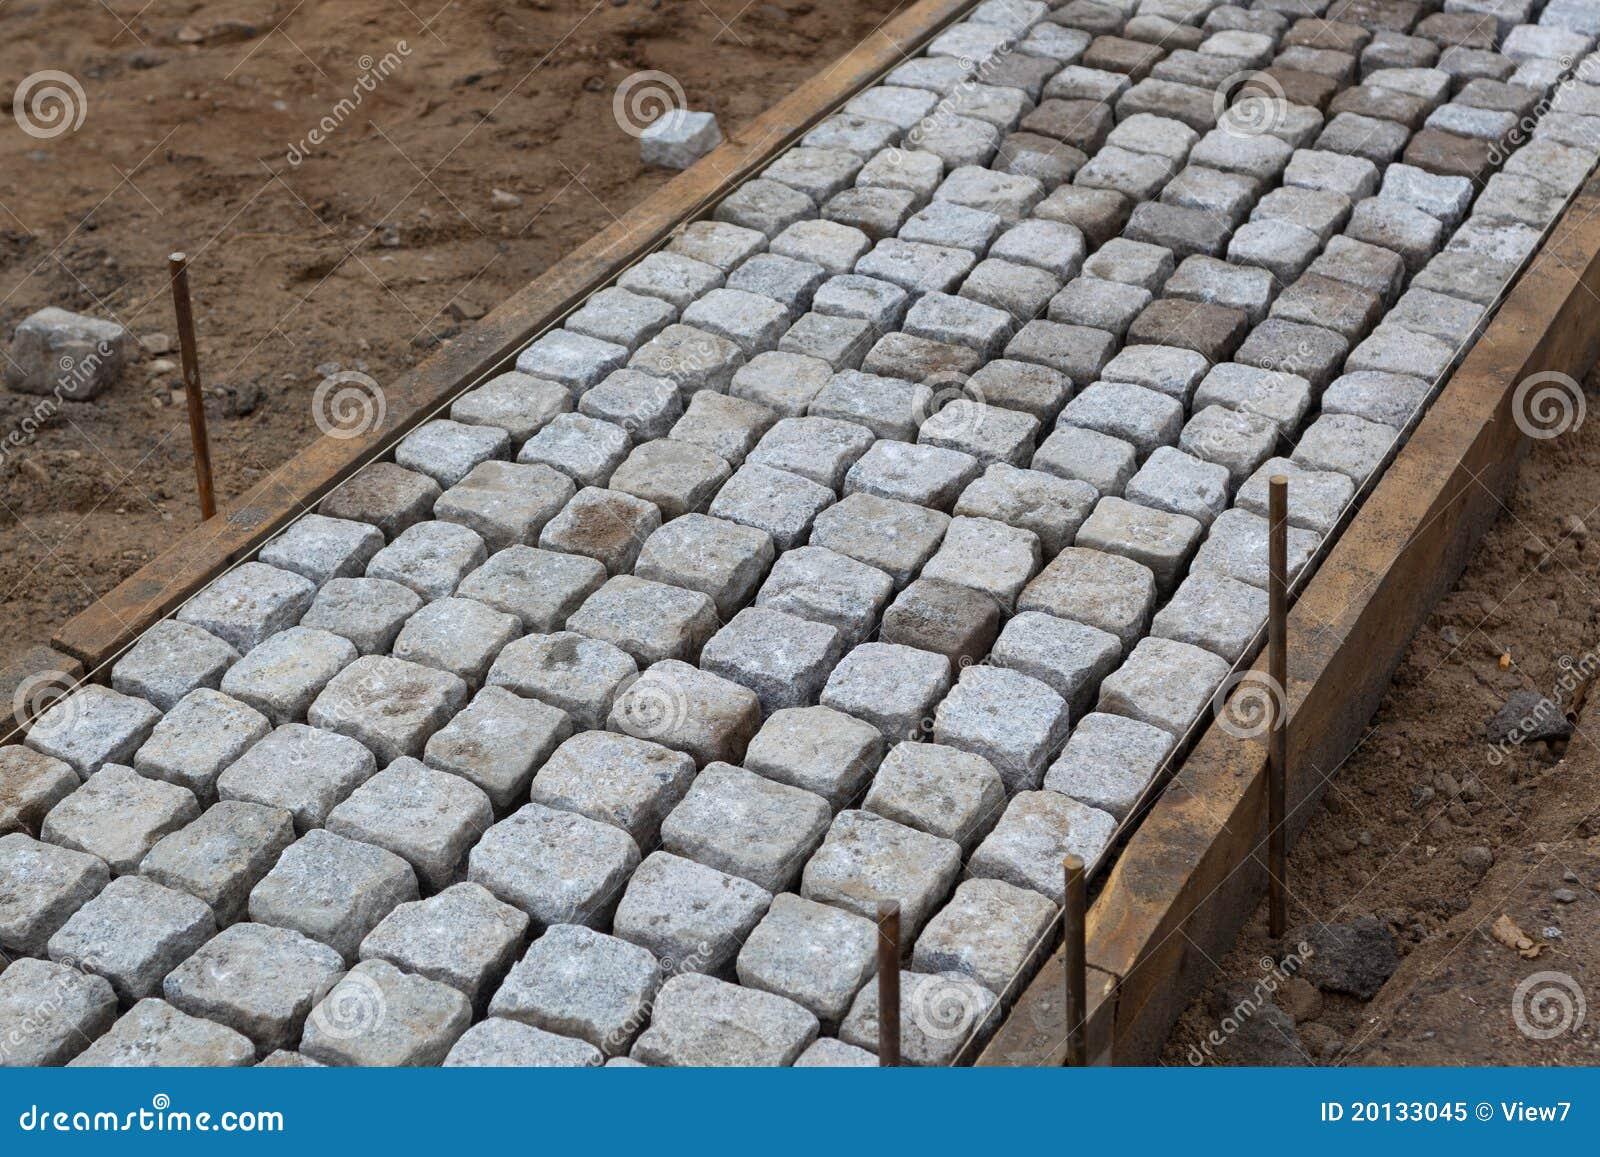 patio block layout gear